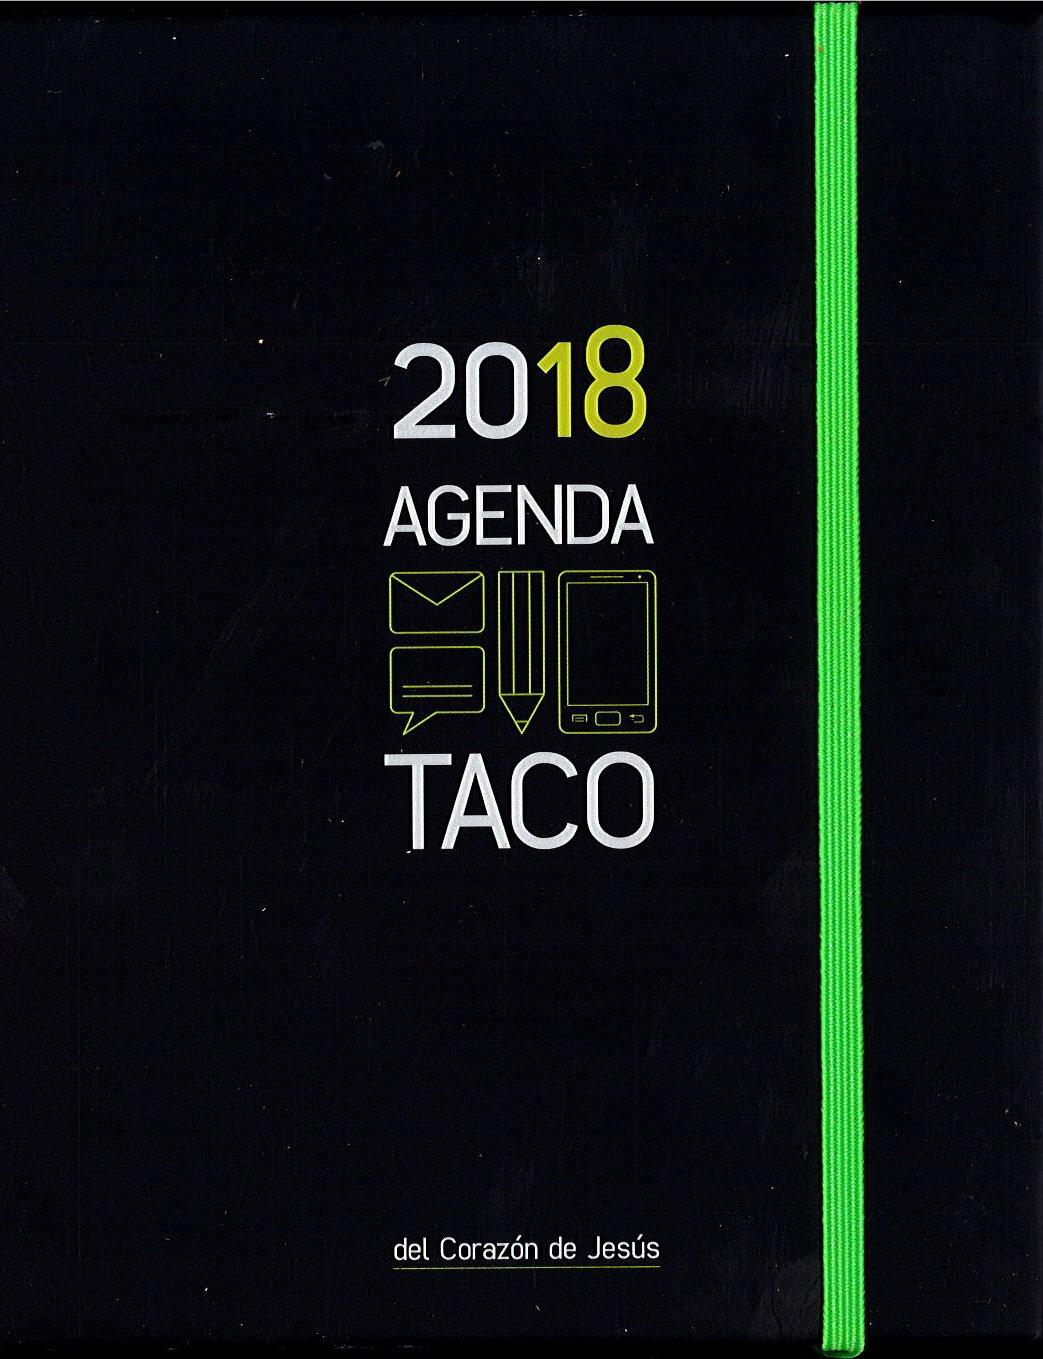 AGENDA 2018 TACO VERDE: 9788427139947: Amazon.com: Books